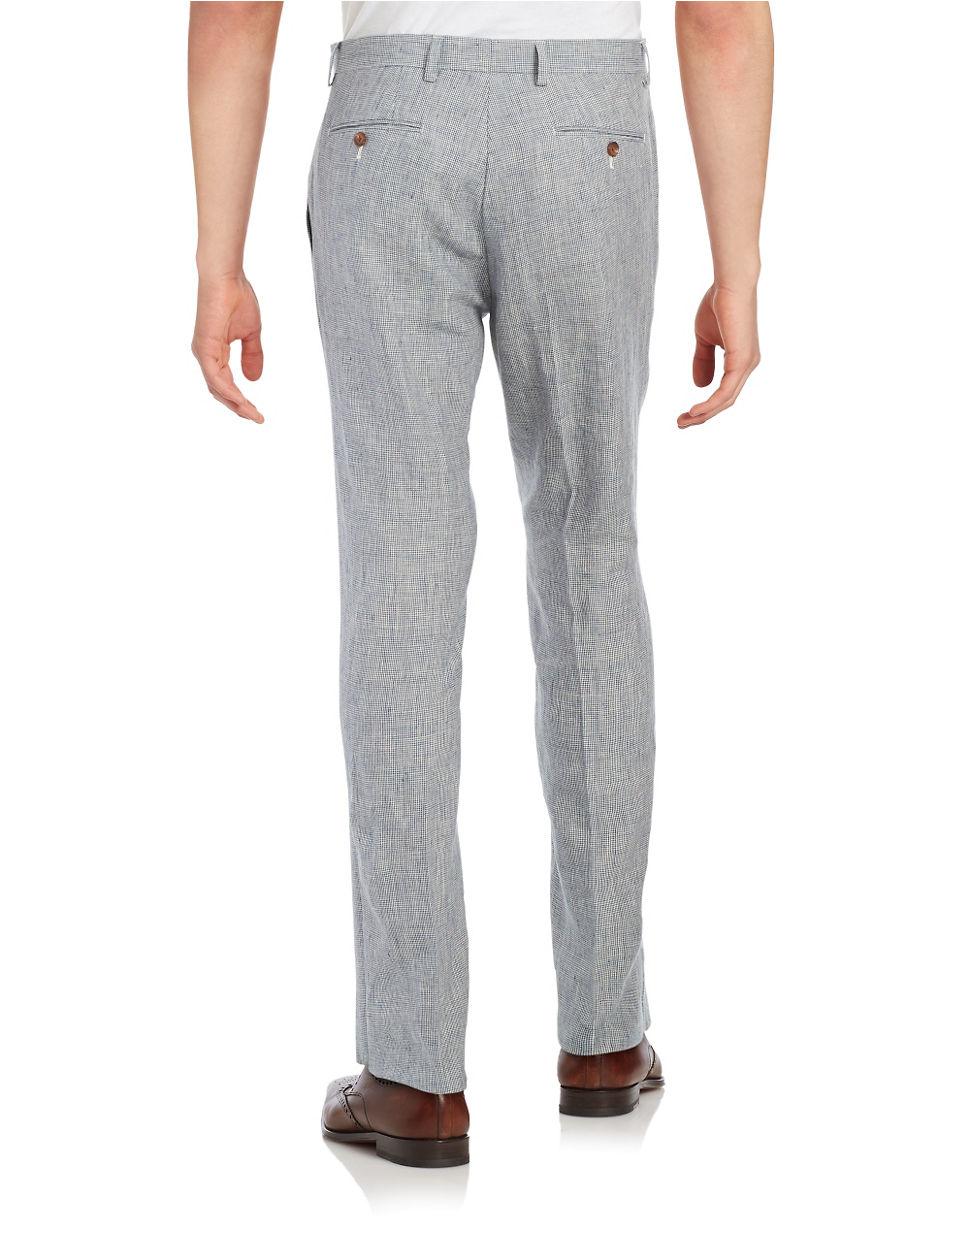 Ralph Lauren Mens Linen Dress Pants Anlis